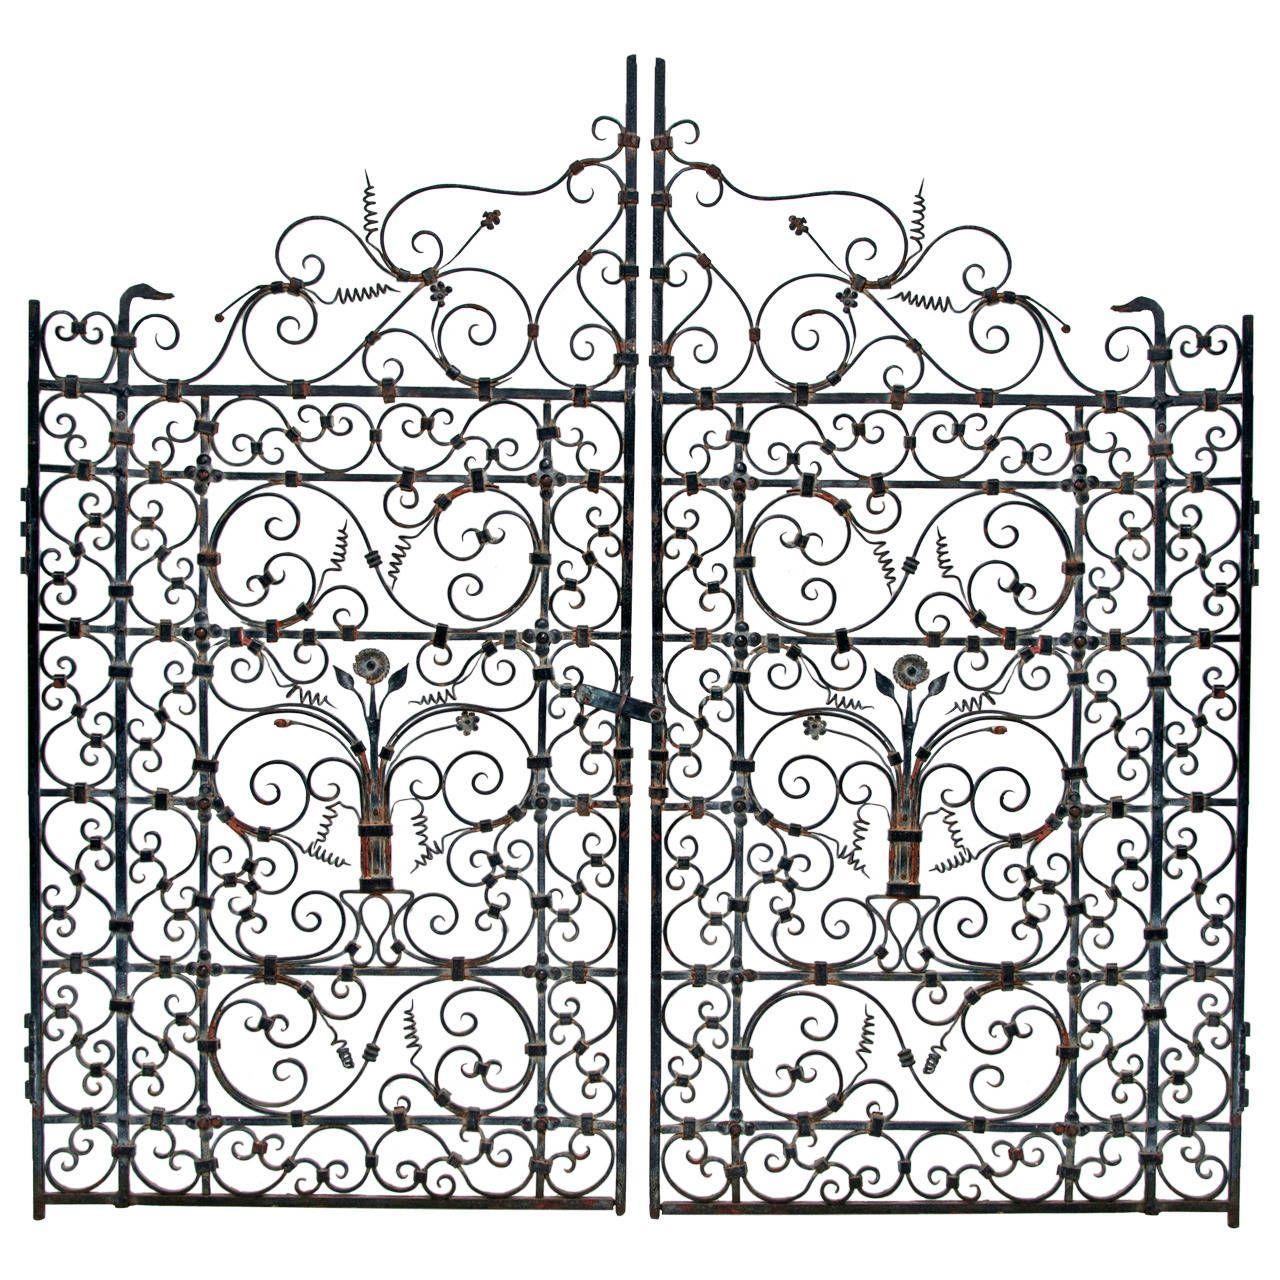 1280x1280 French Or Spanish Wrought Iron Garden Gate, Circa 1820